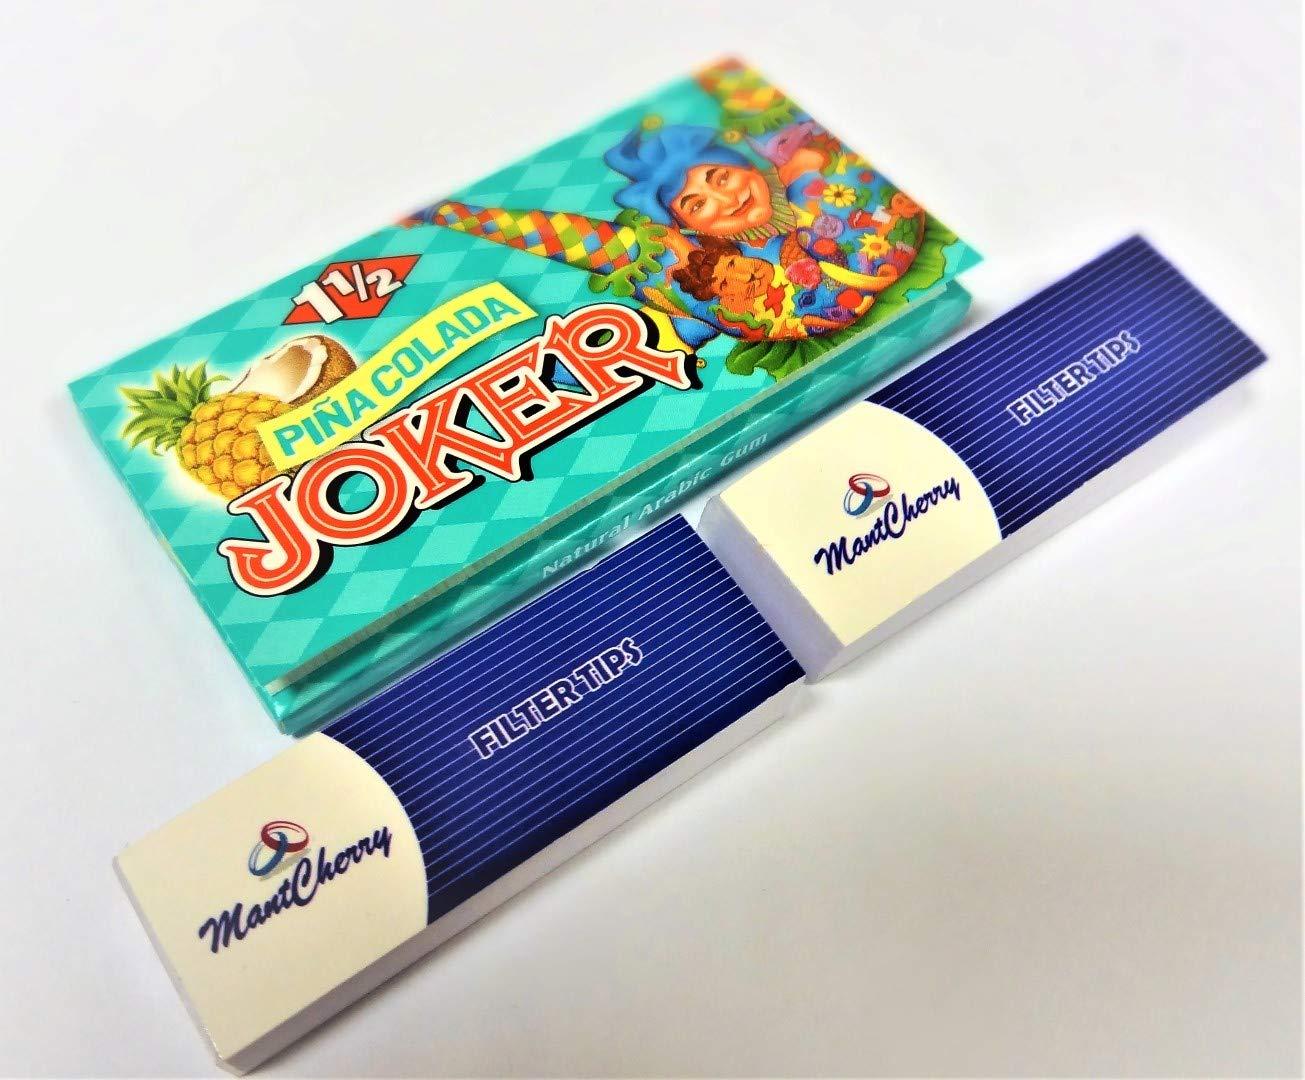 JOKER Brand 1–1/2Größe besten Geschmack Zigarette Papier in 'Pina Colada Geschmack–12Heftchen